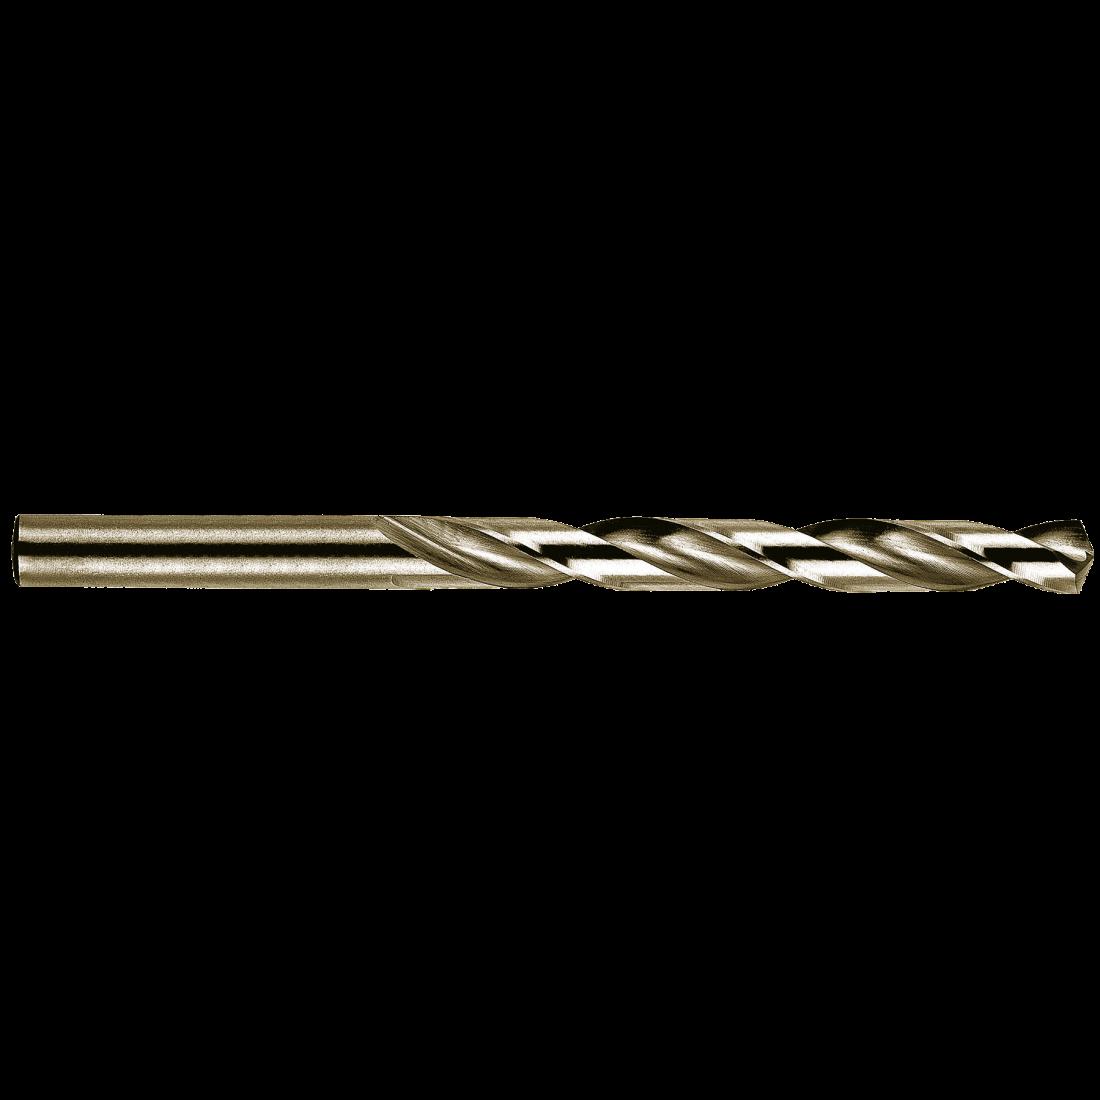 Сверло по металлу Heller НSS-Co DIN 338 RN  9,5x81x125мм (10шт)